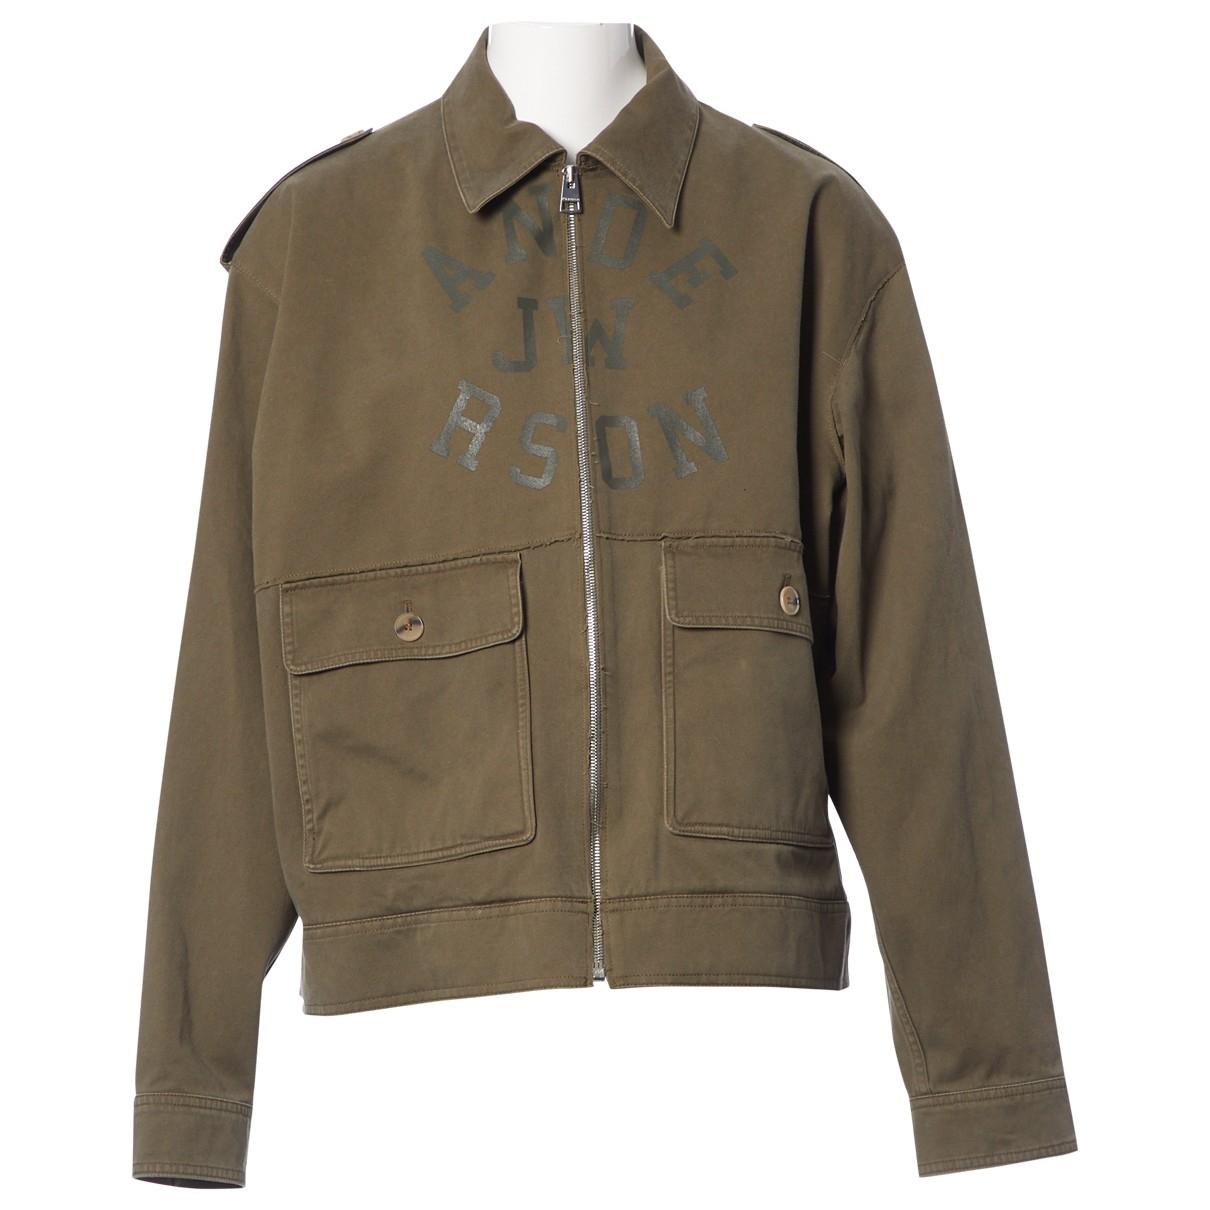 J.w. Anderson \N Khaki Cotton jacket for Women 50-52 IT